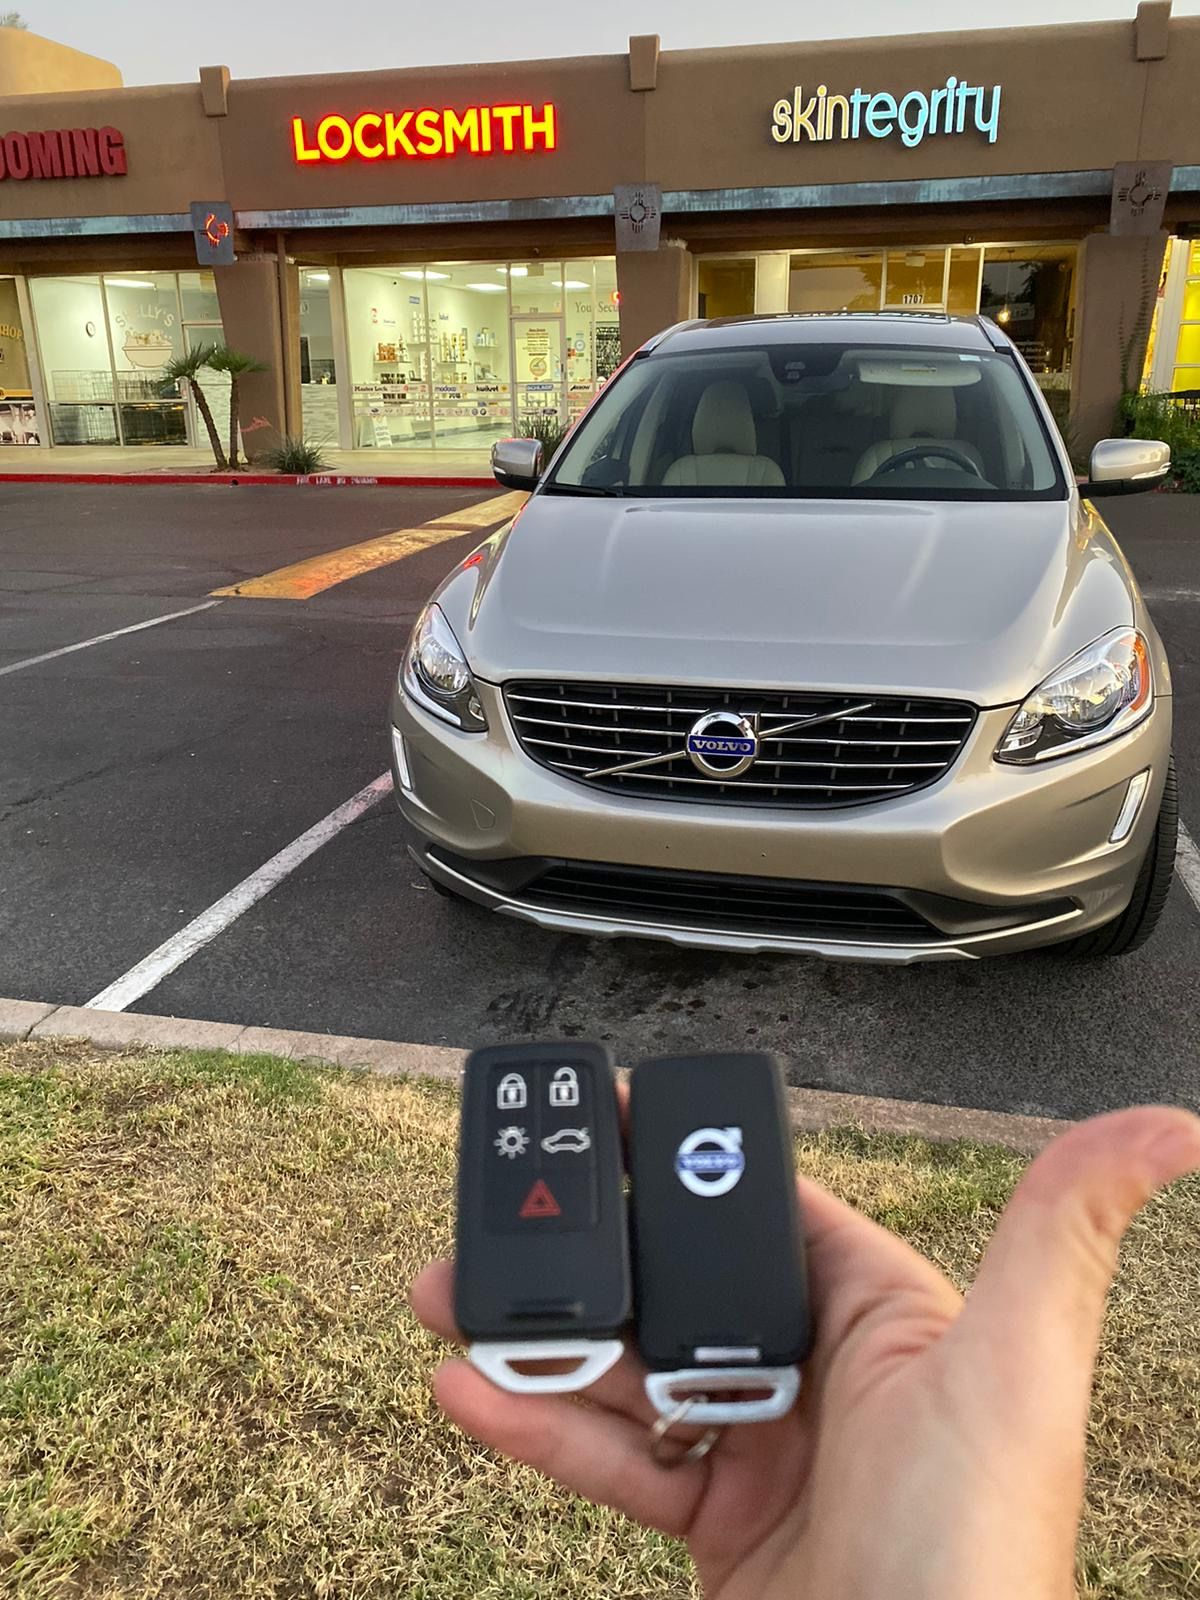 2016 Volvo Xc60 5 Button Smart Key Spare Smart Key Duplication Car Key Replacement Locksmith Smart Key